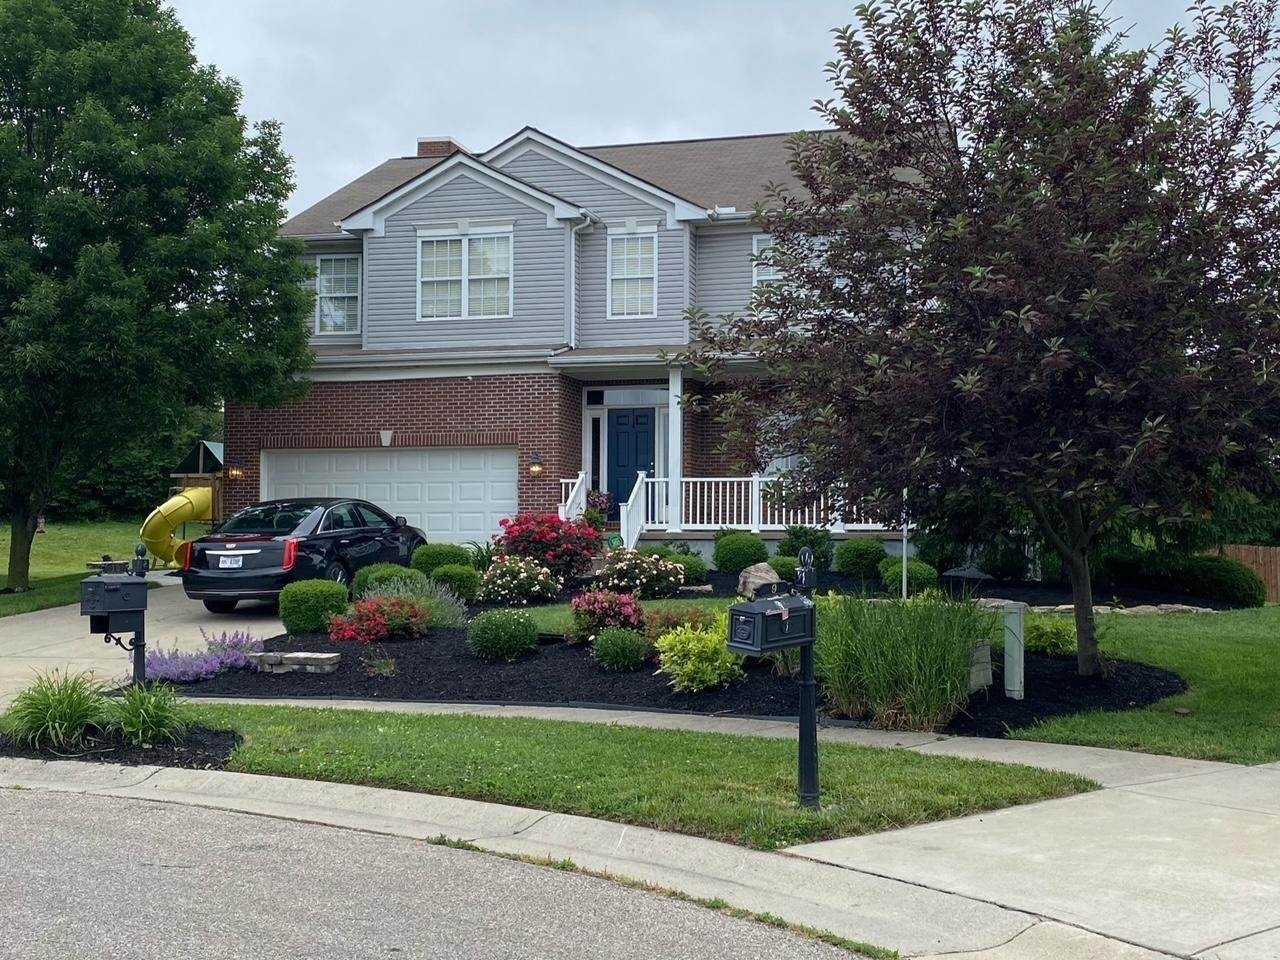 Single Family Homes for Sale at 10 Rowley Cincinnati, Ohio 45246 United States